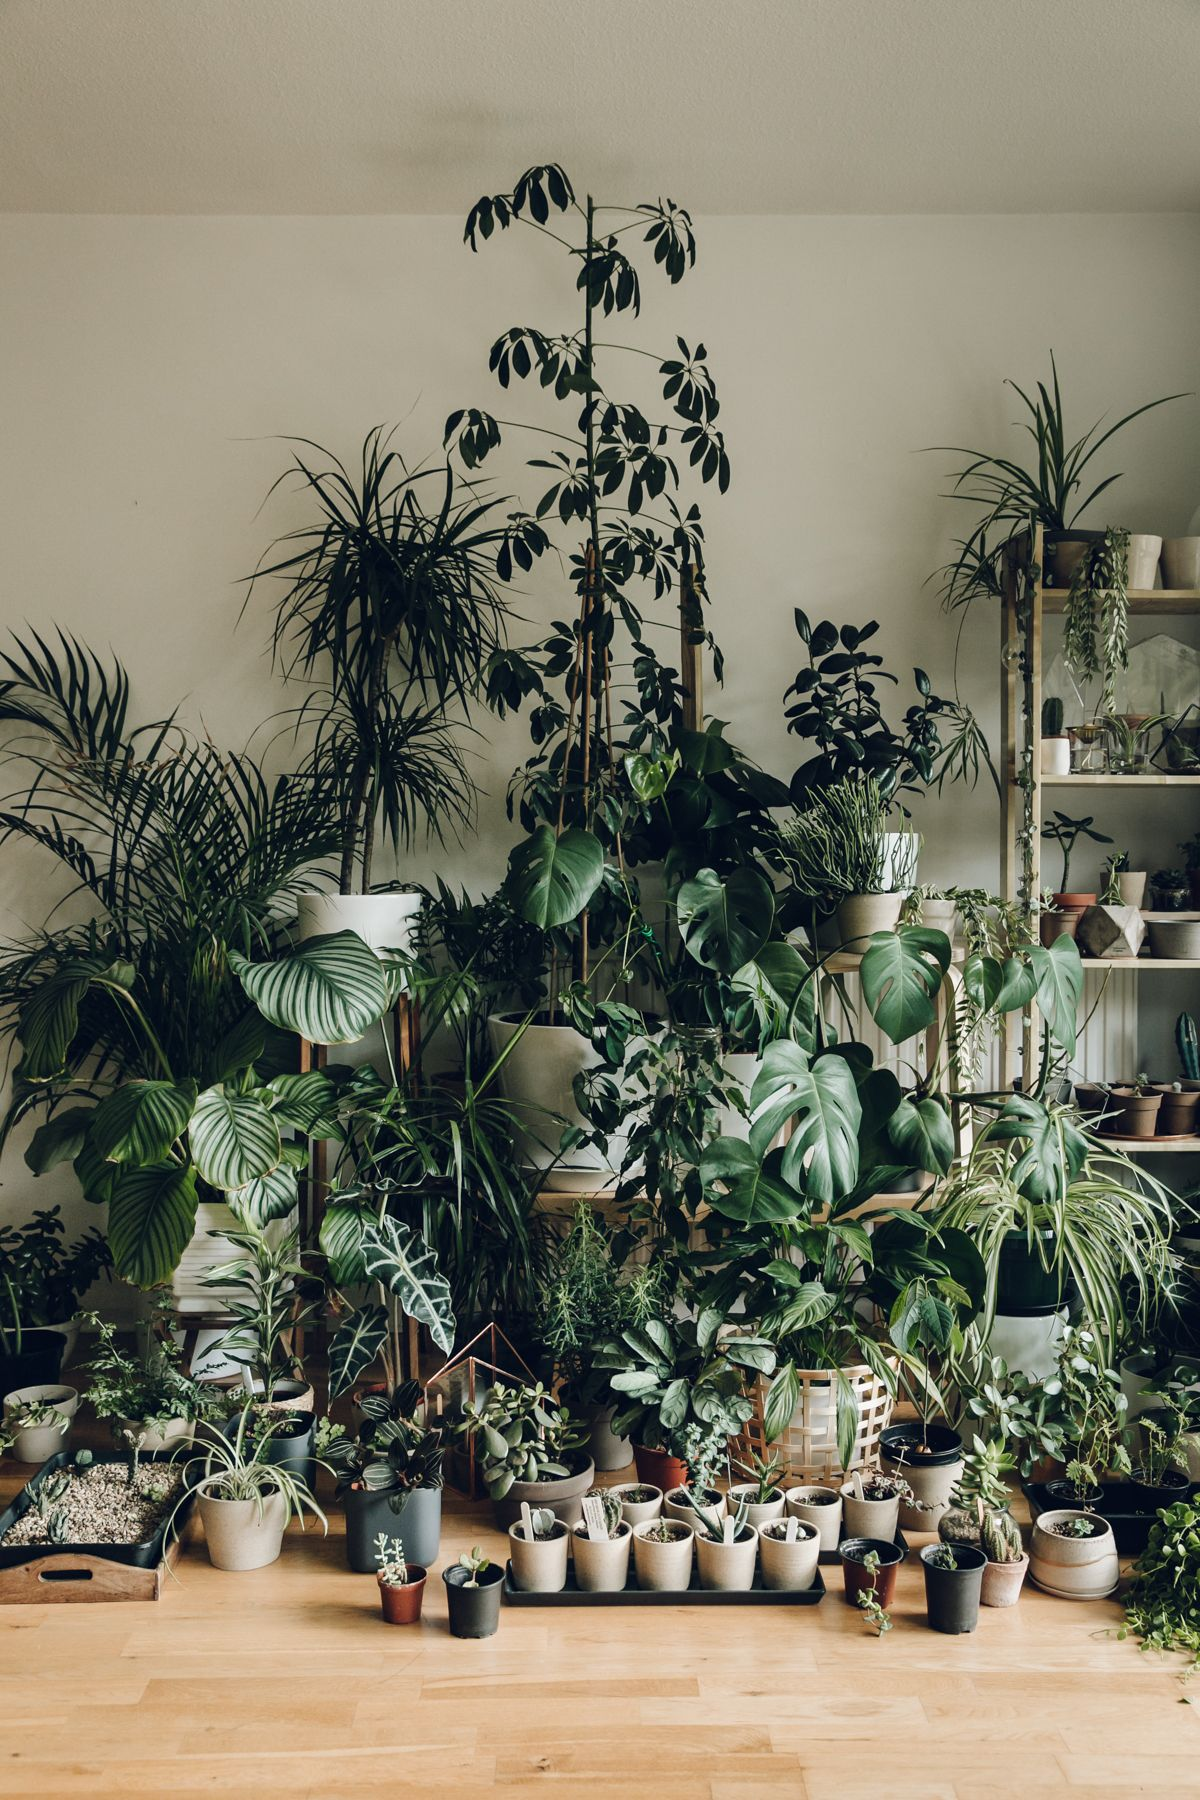 Piante Rampicanti Da Interno the haarkon house - an autumnal update | piante da interno